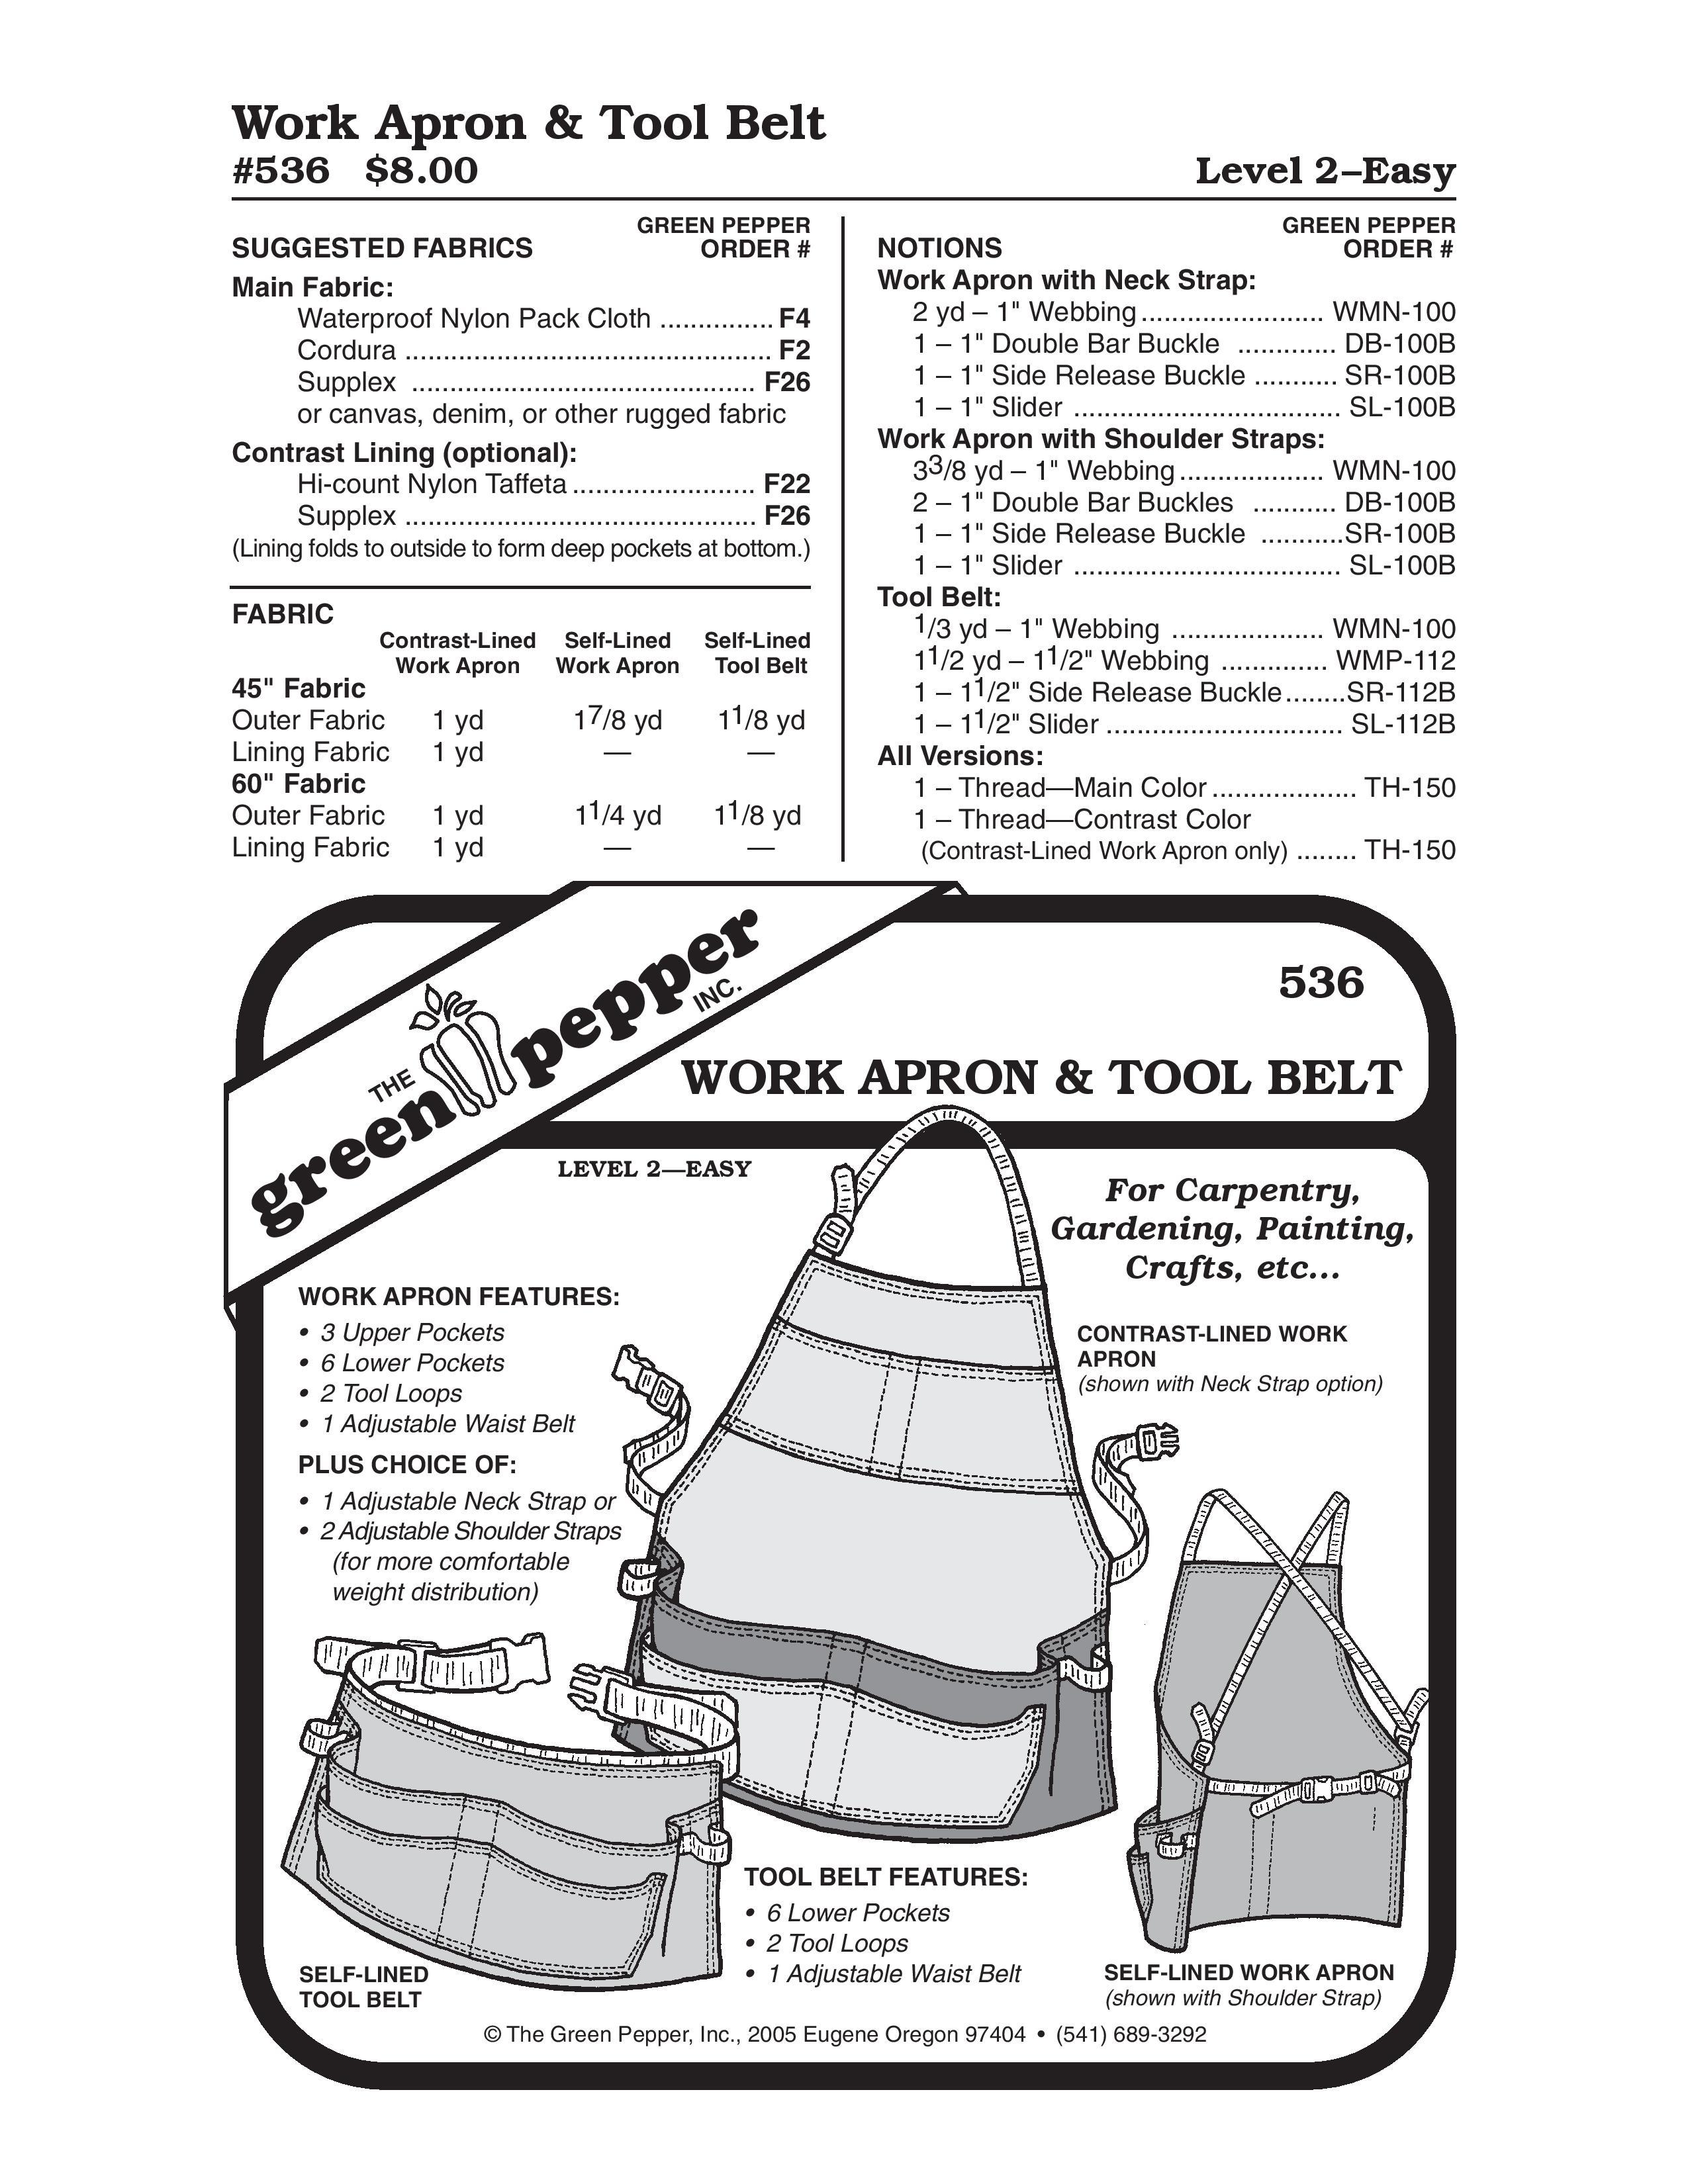 Work Apron & Tool Belt Sewing Pattern